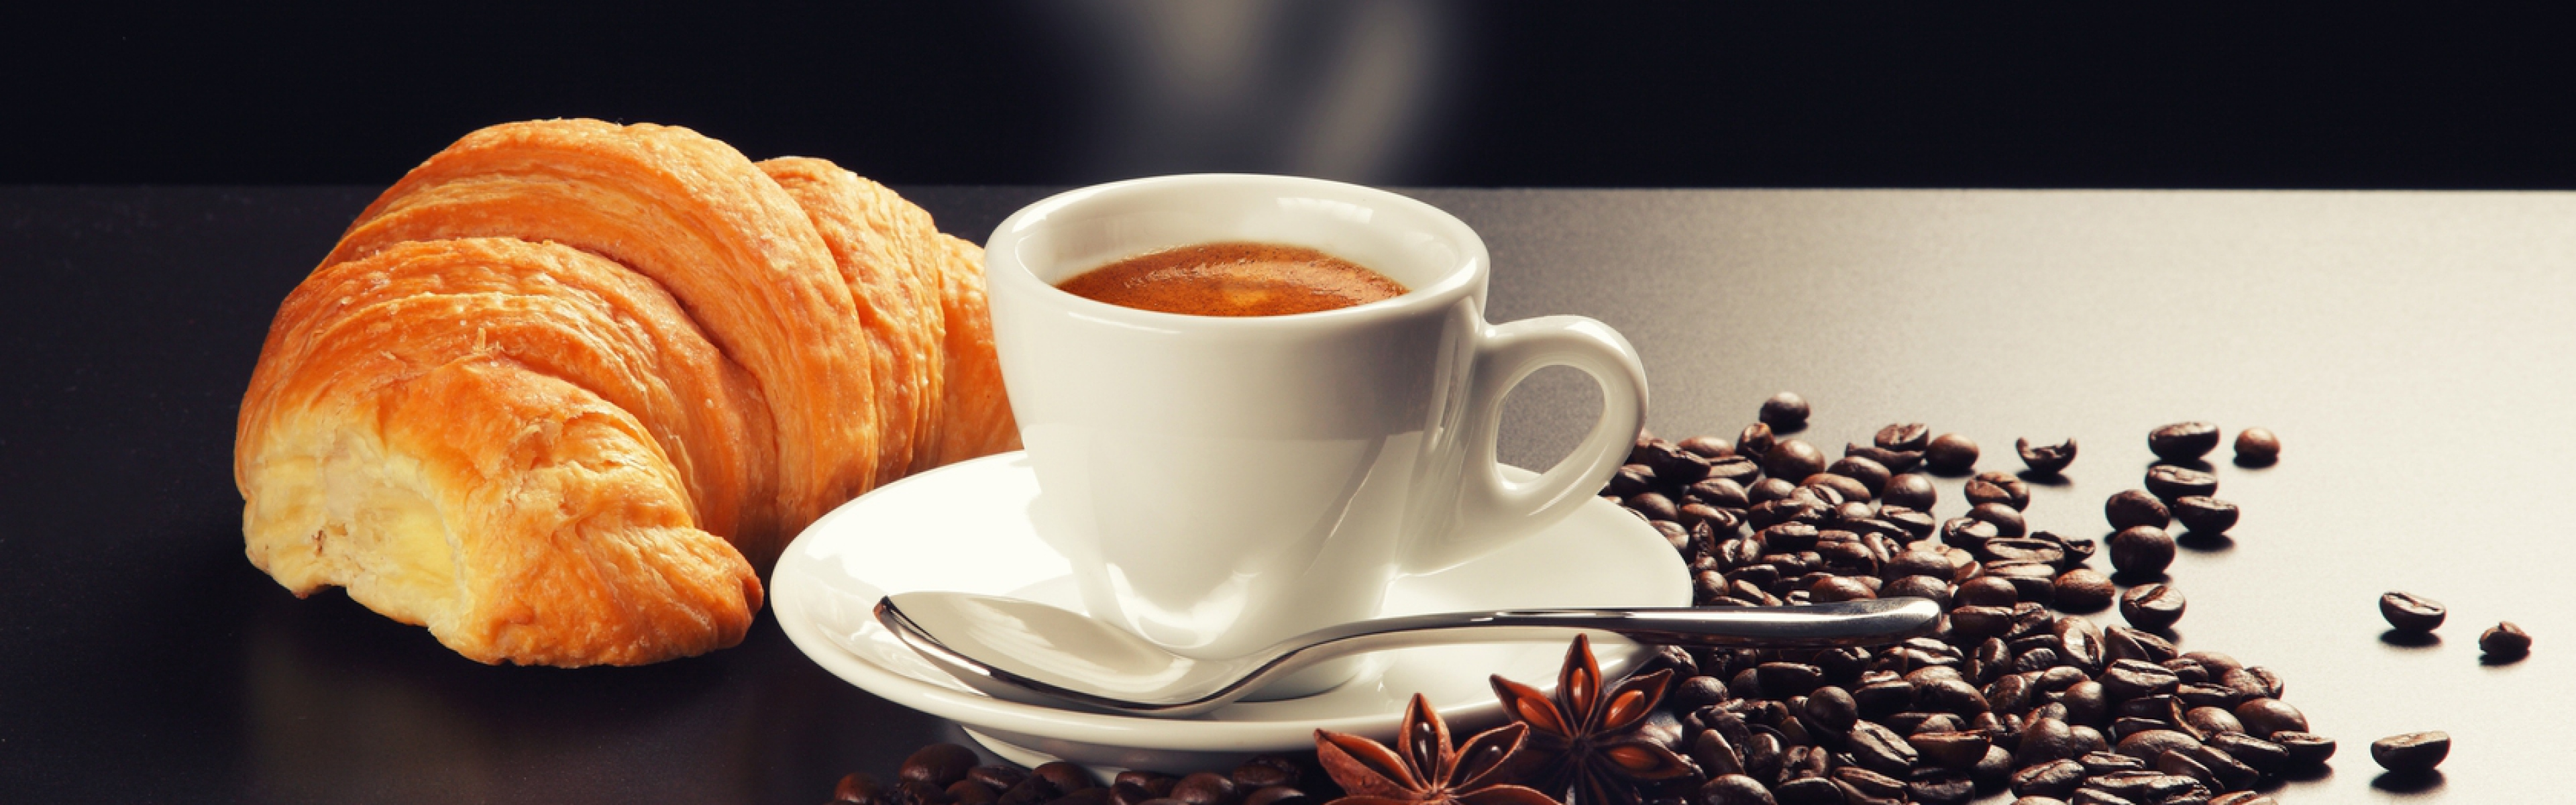 3840x1200 Wallpaper saucer, coffee, smoke, grain, spoon, cappuccino, foam,